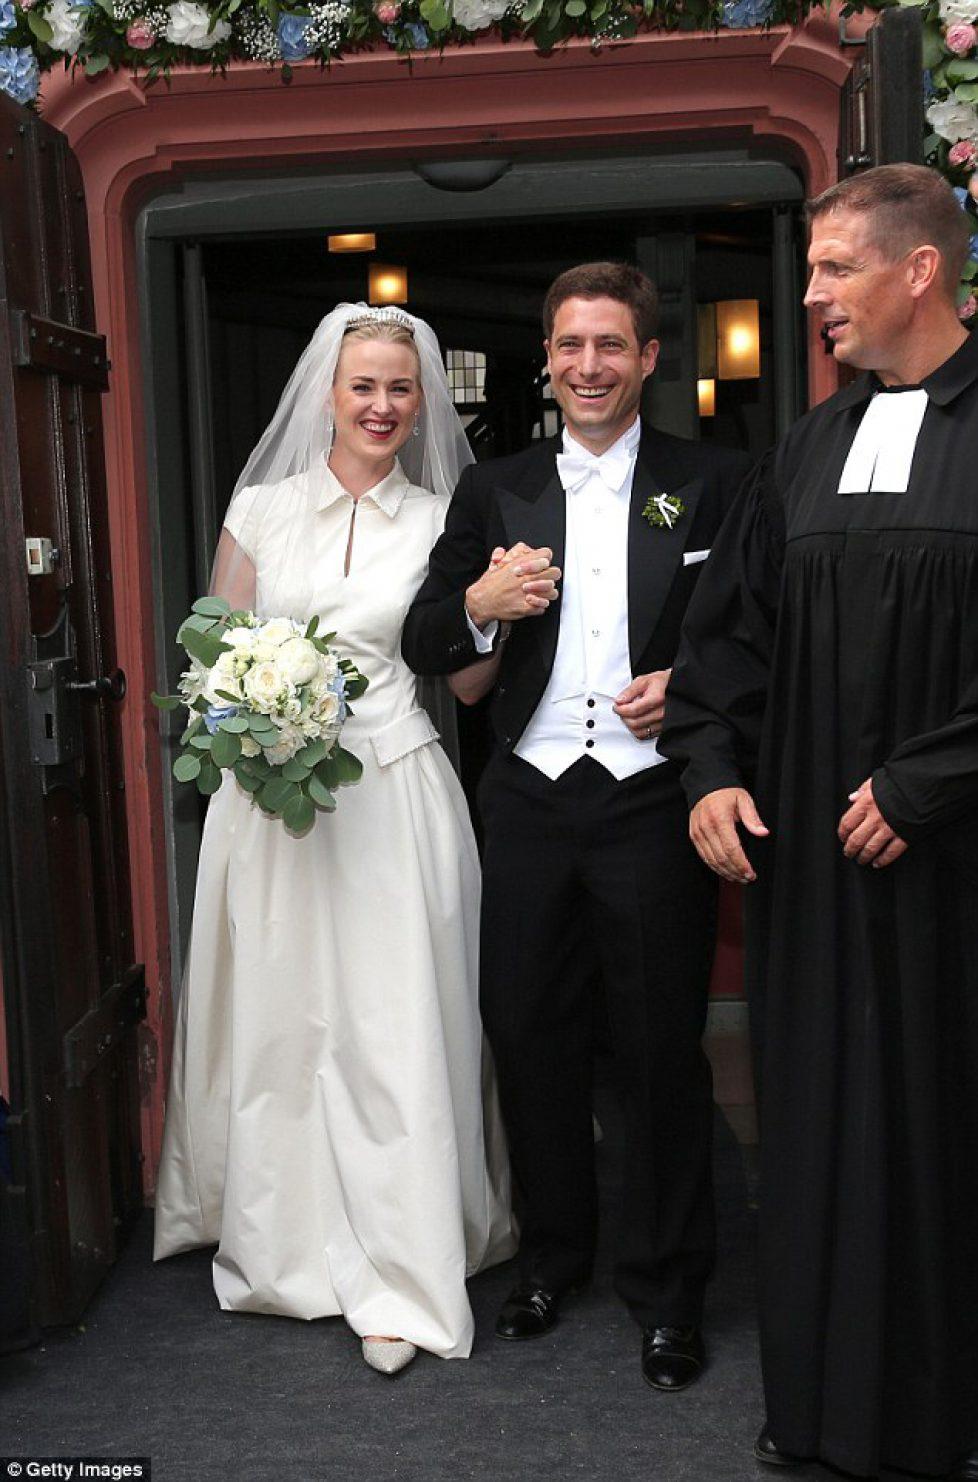 4E79C8EB00000578-5979157-Her_Serene_Highness_Princess_Theodora_Sayn_Wittgenstein_married_-a-15_1532247685698